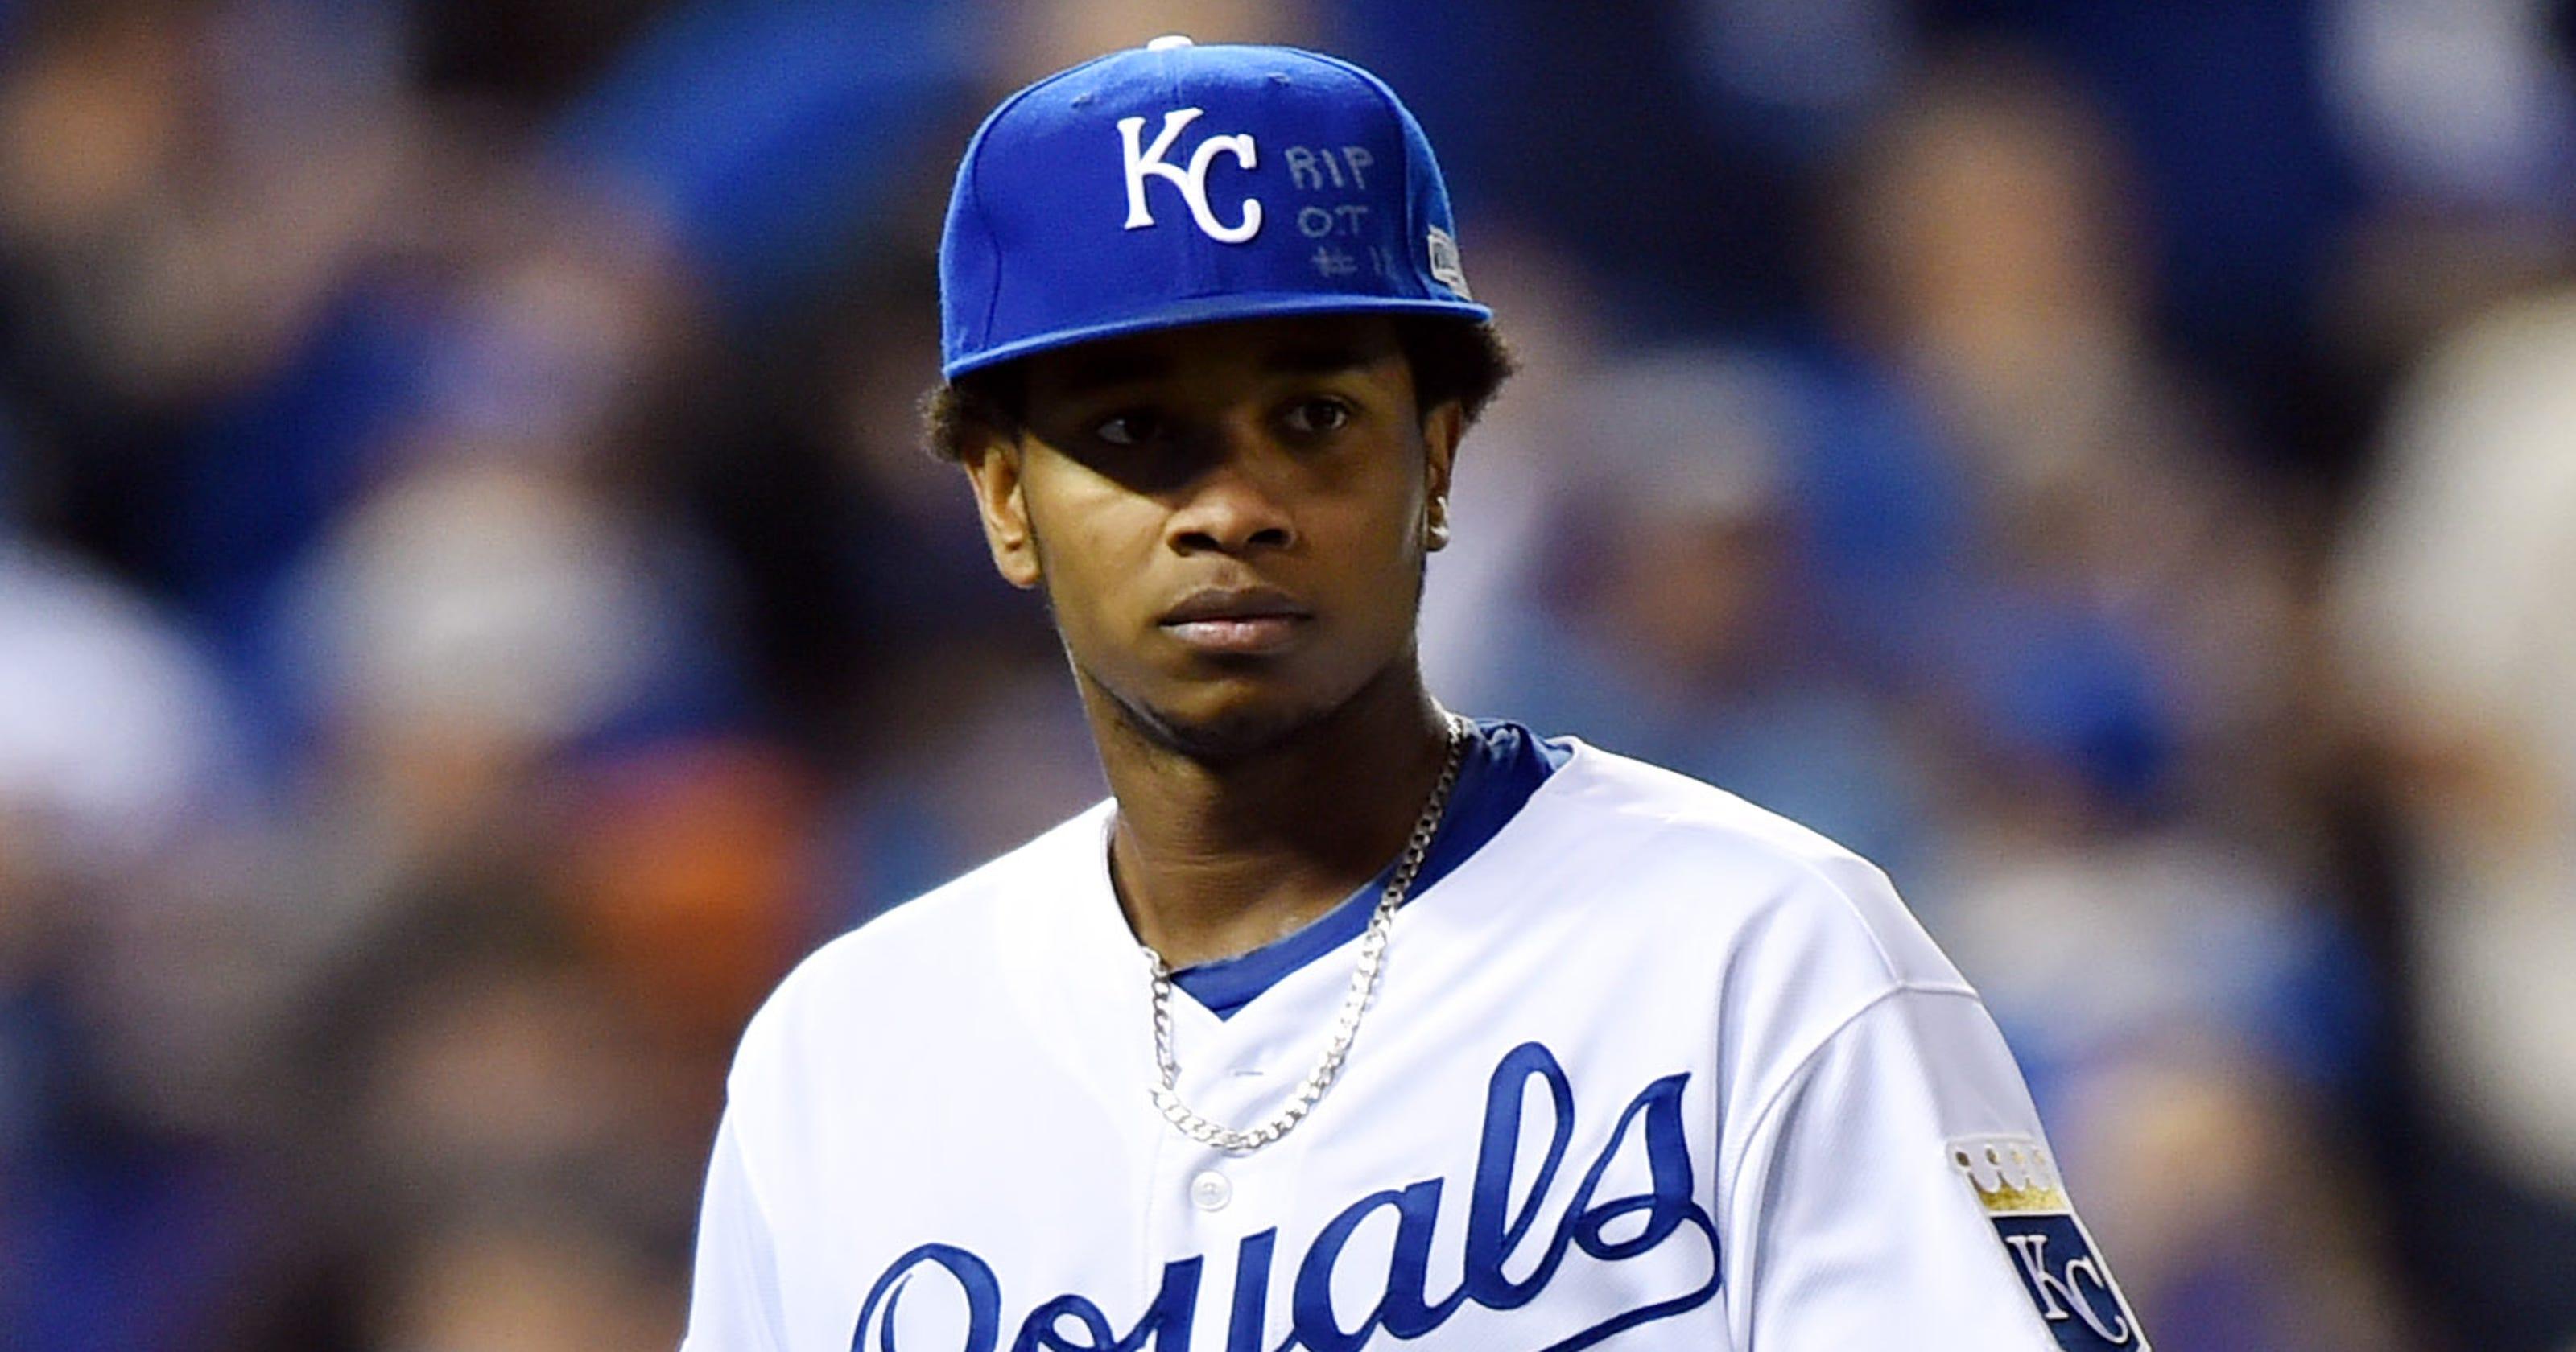 5e2e0e911 Royals pitcher Yordano Ventura dies in car crash in Dominican Republic